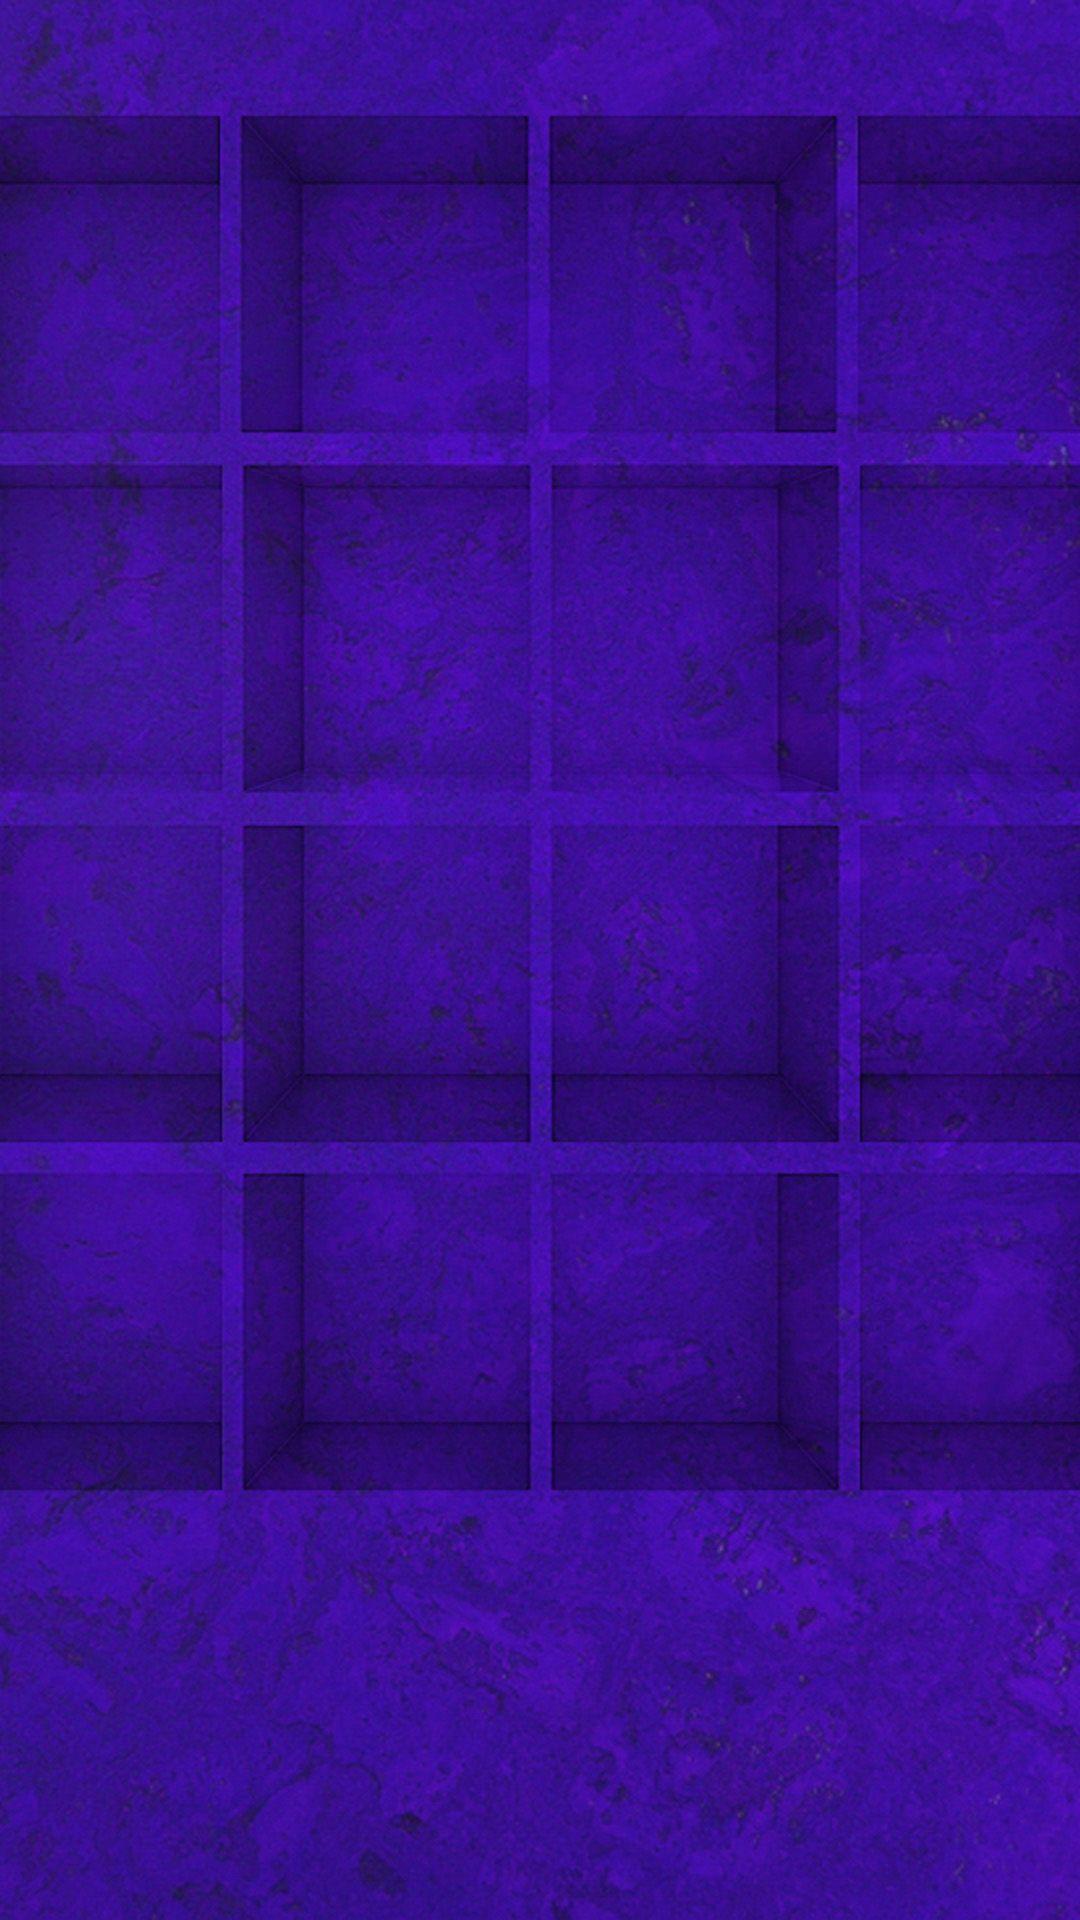 Purple Marble Wallpapers - Top Free Purple Marble ...